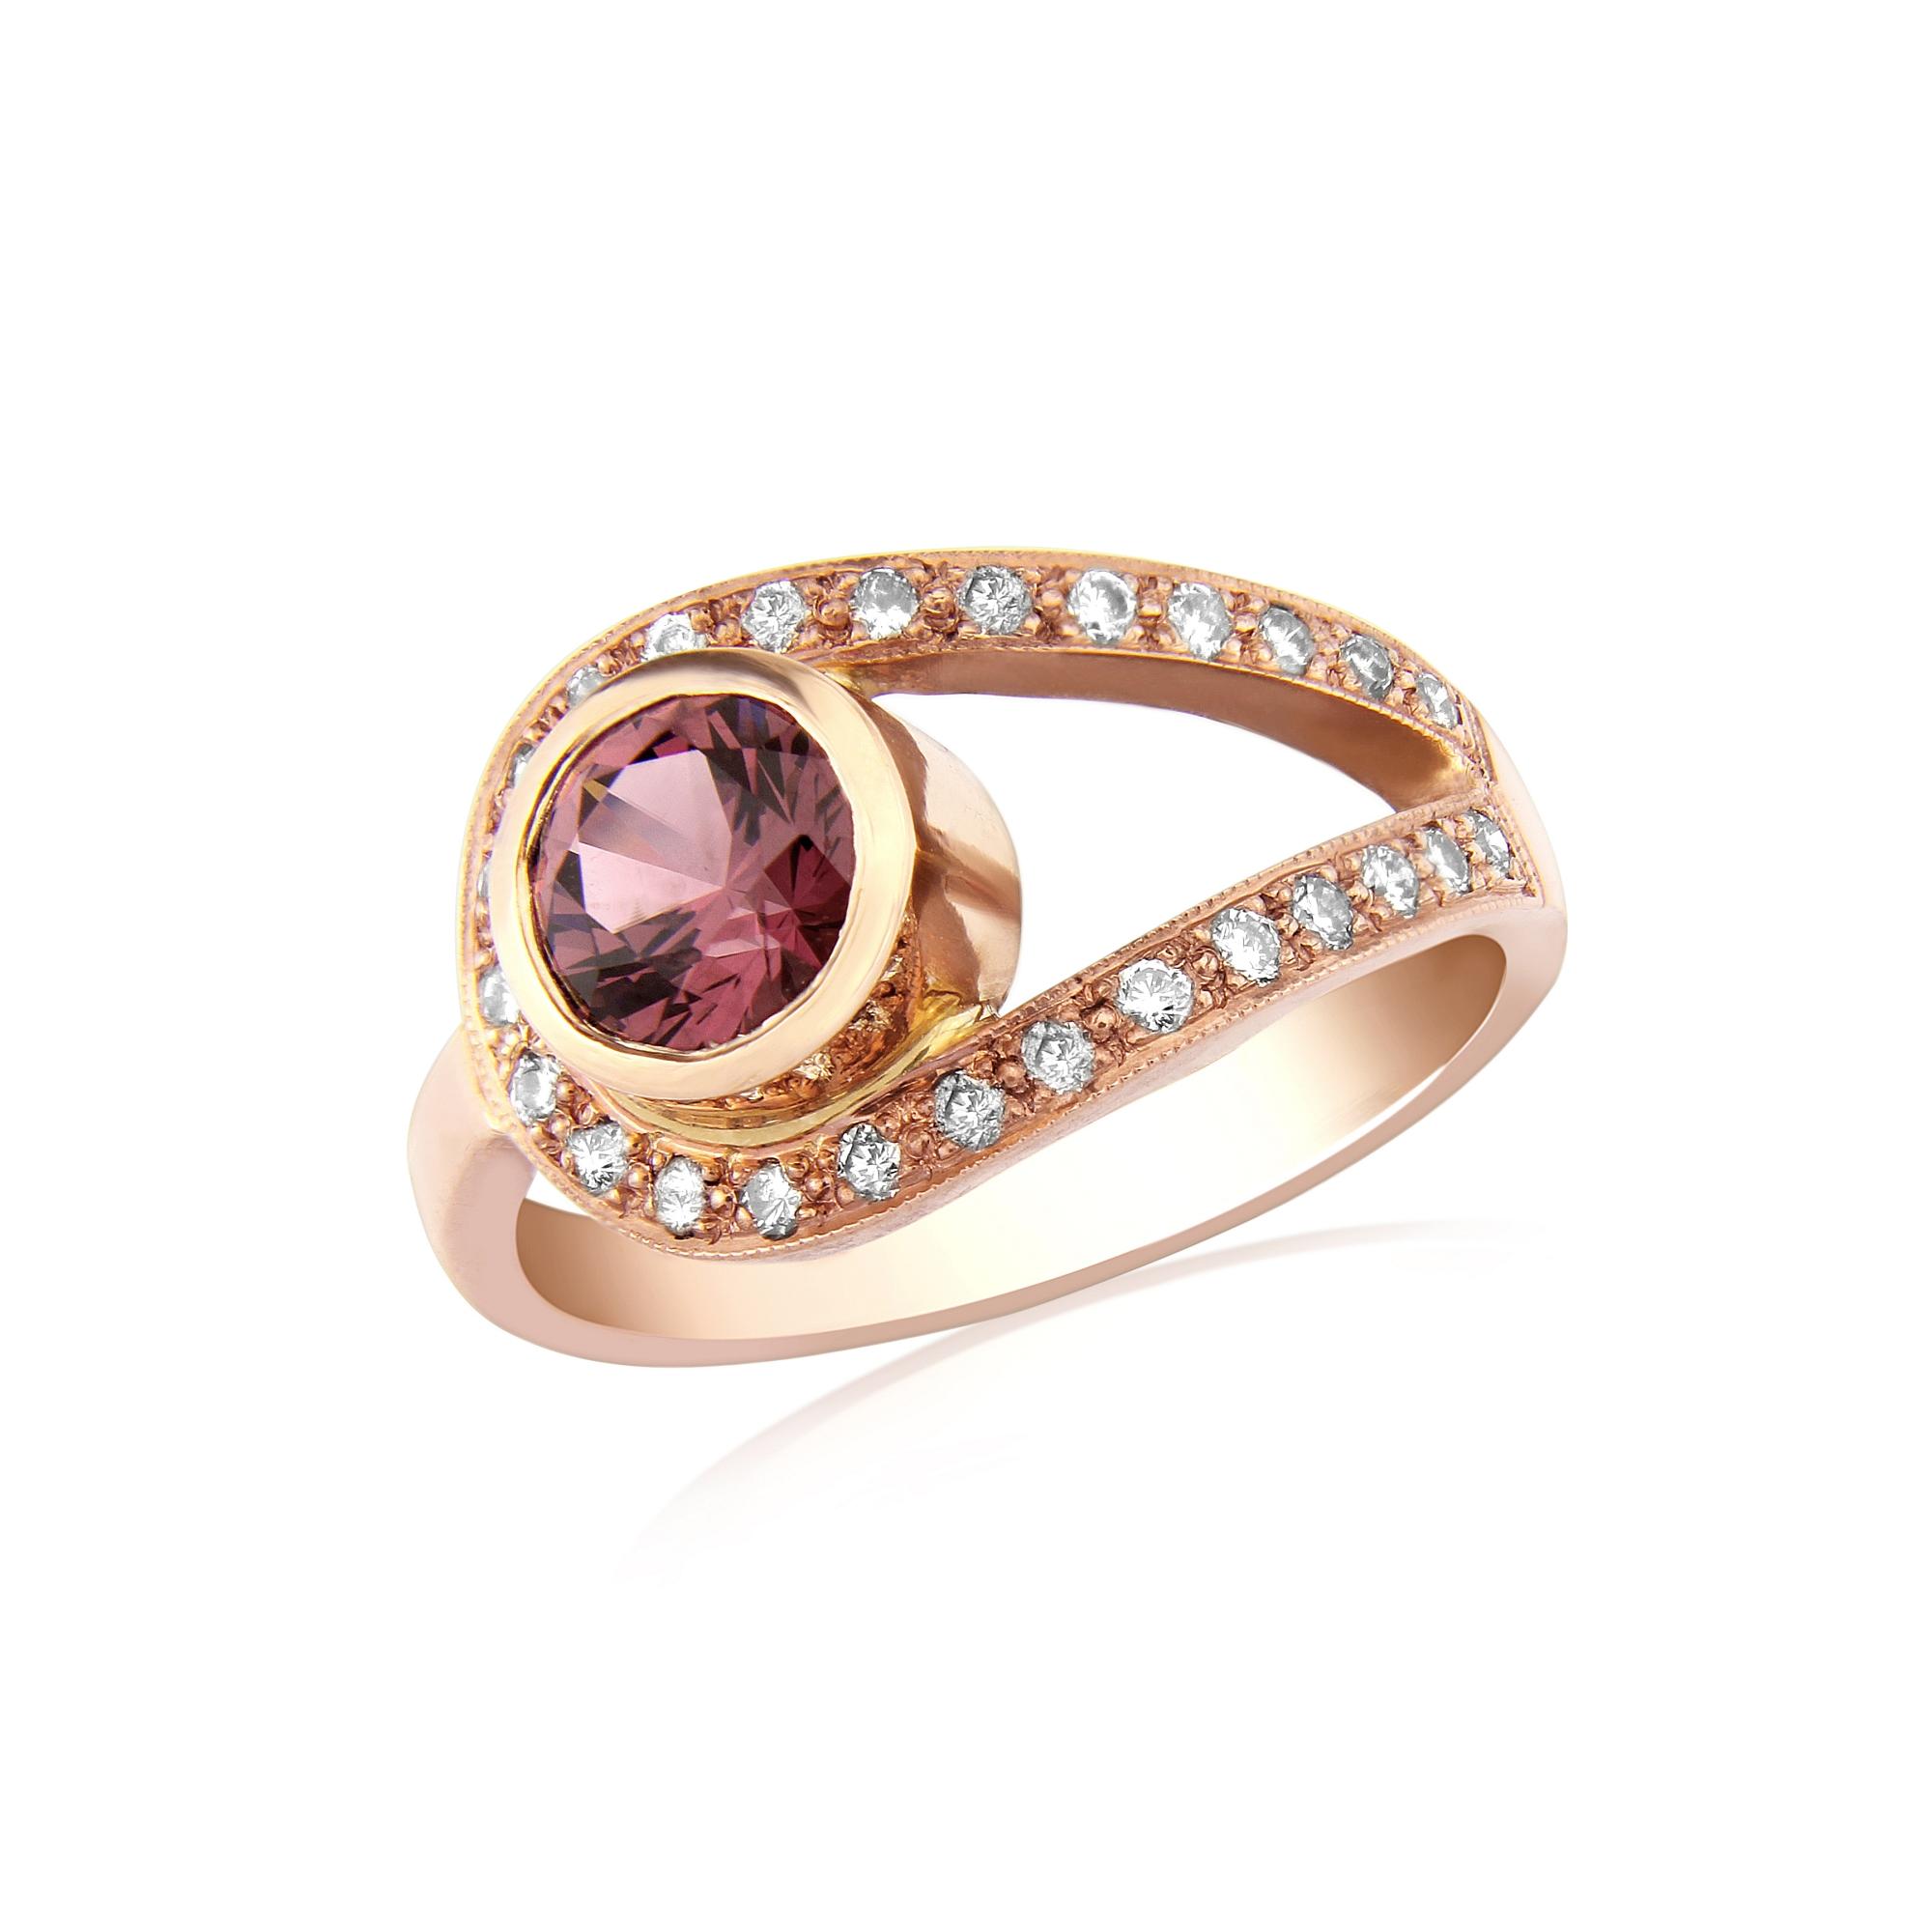 Diamond cut Rhodolite Garnet and diamond dress ring mounted in red gold.